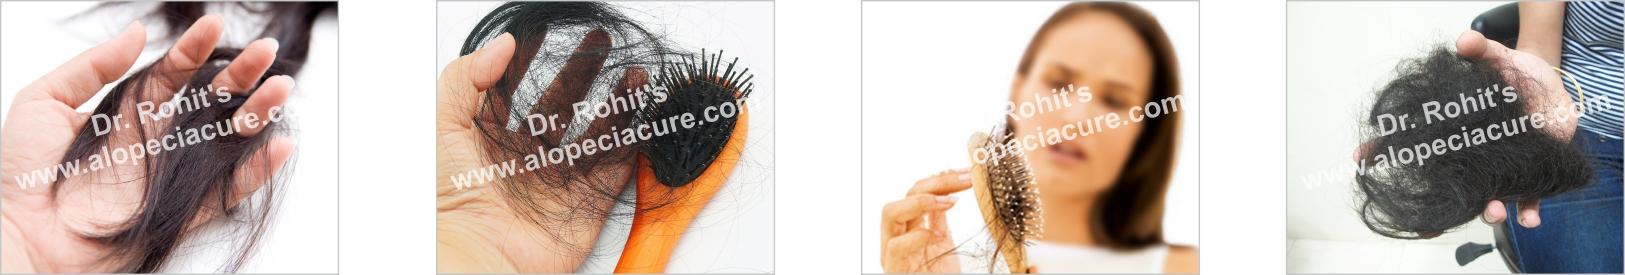 alopecia hair loss treatment - ayurvedic treatment - no side effect